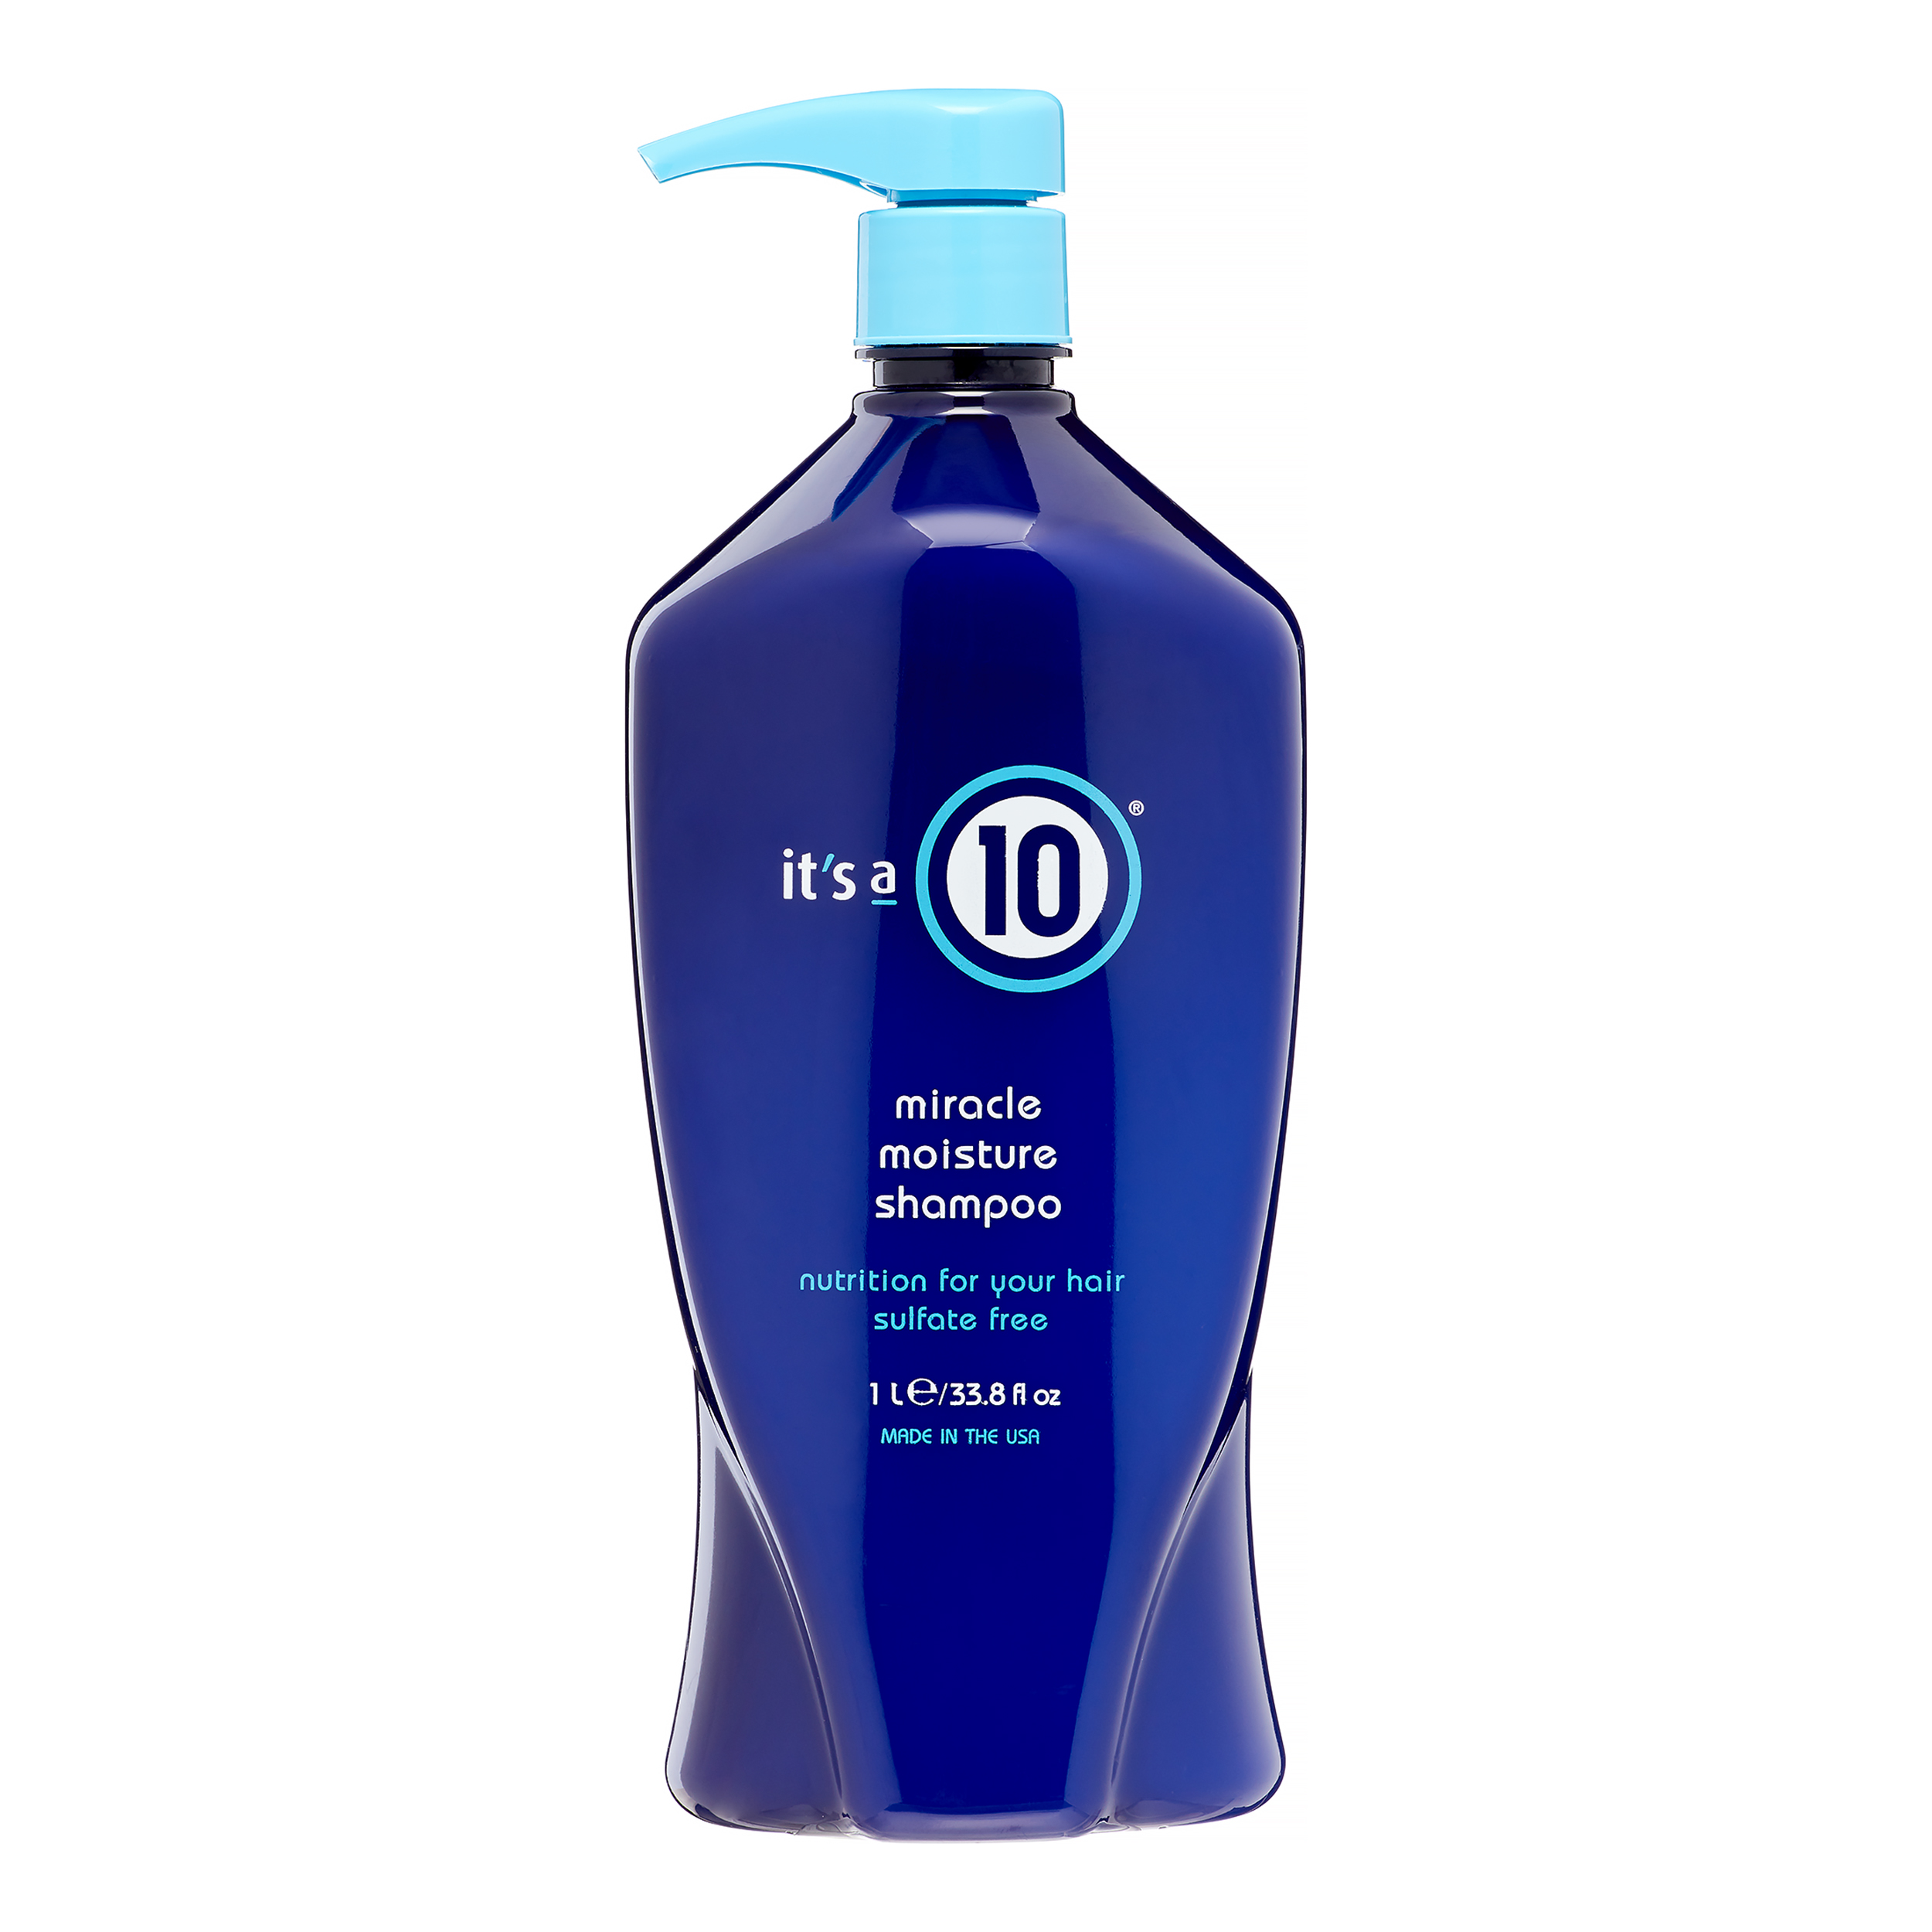 It's A 10 Miracle Moisture Shampoo, 33.8 Fl Oz